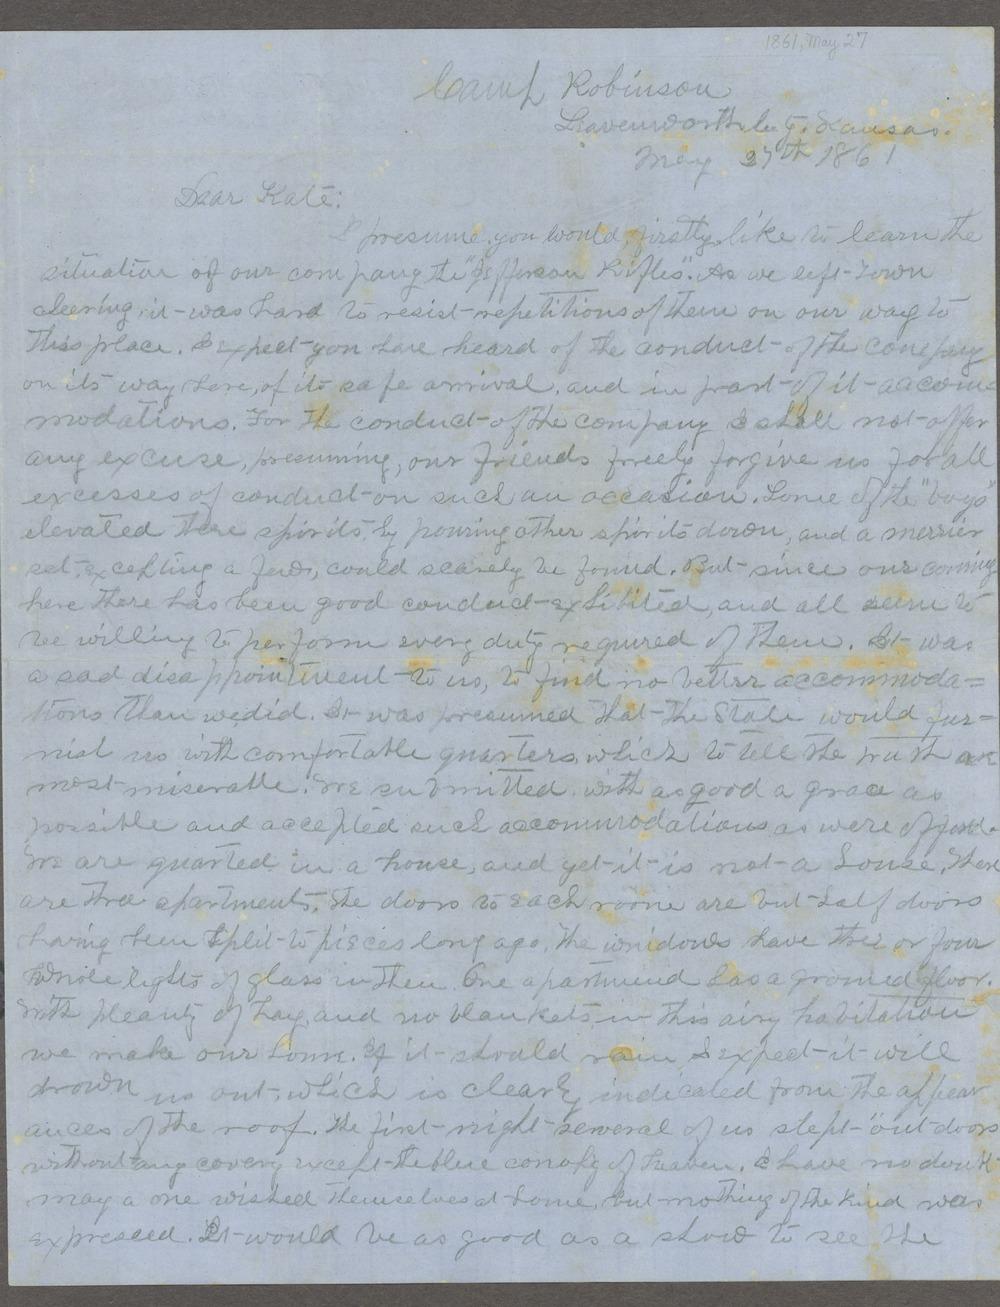 Lewis Stafford to Kate Newland correspondence - 8